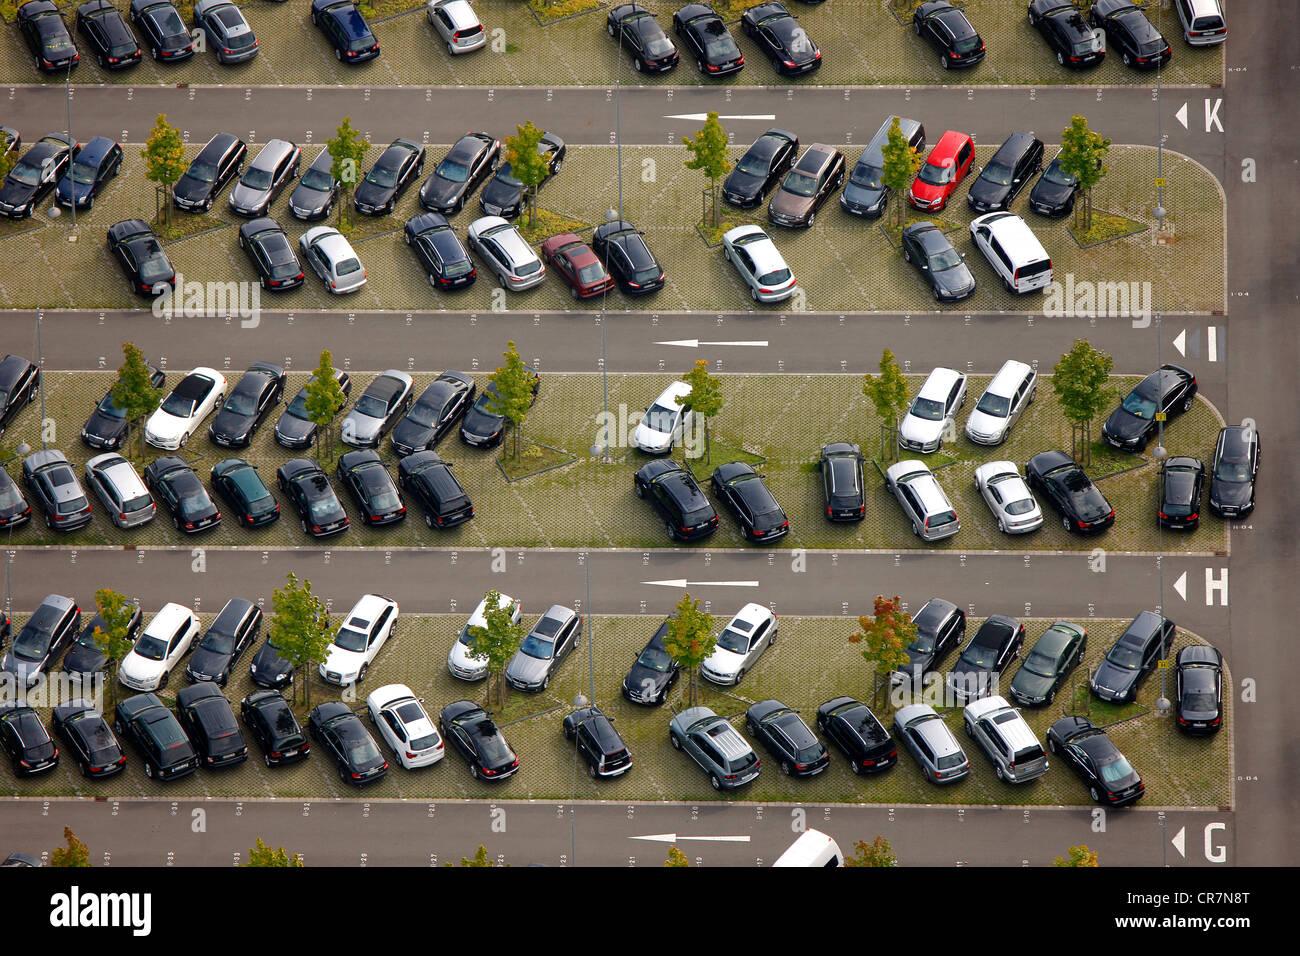 Aerial view, VIP parking, Westfalenstadion football stadium, Signal Iduna Park, Dortmund, Ruhr area, North Rhine - Stock Image